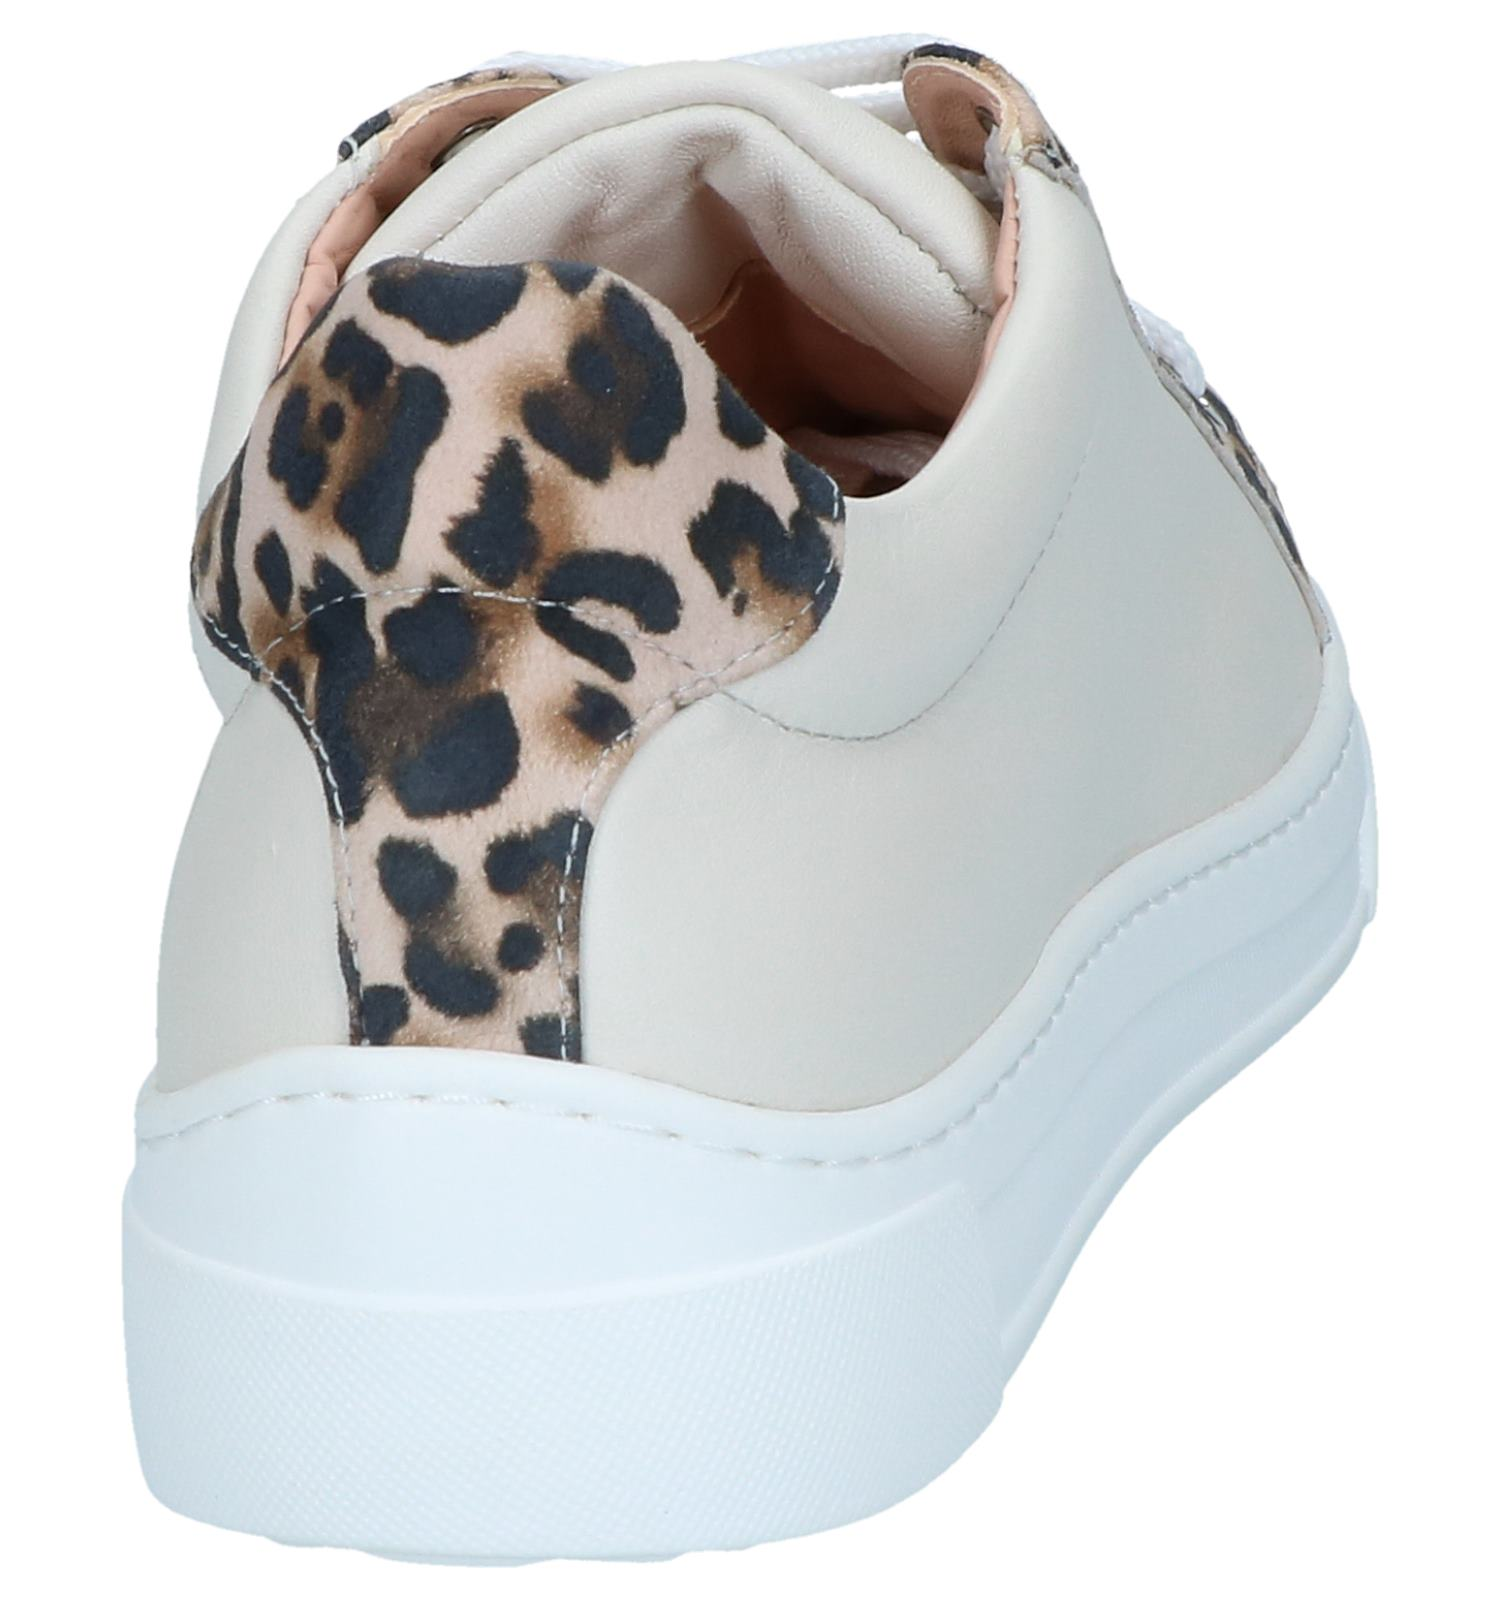 Witte Lage Sneakers Unisa Franci | SCHOENENTORFS.NL | Gratis